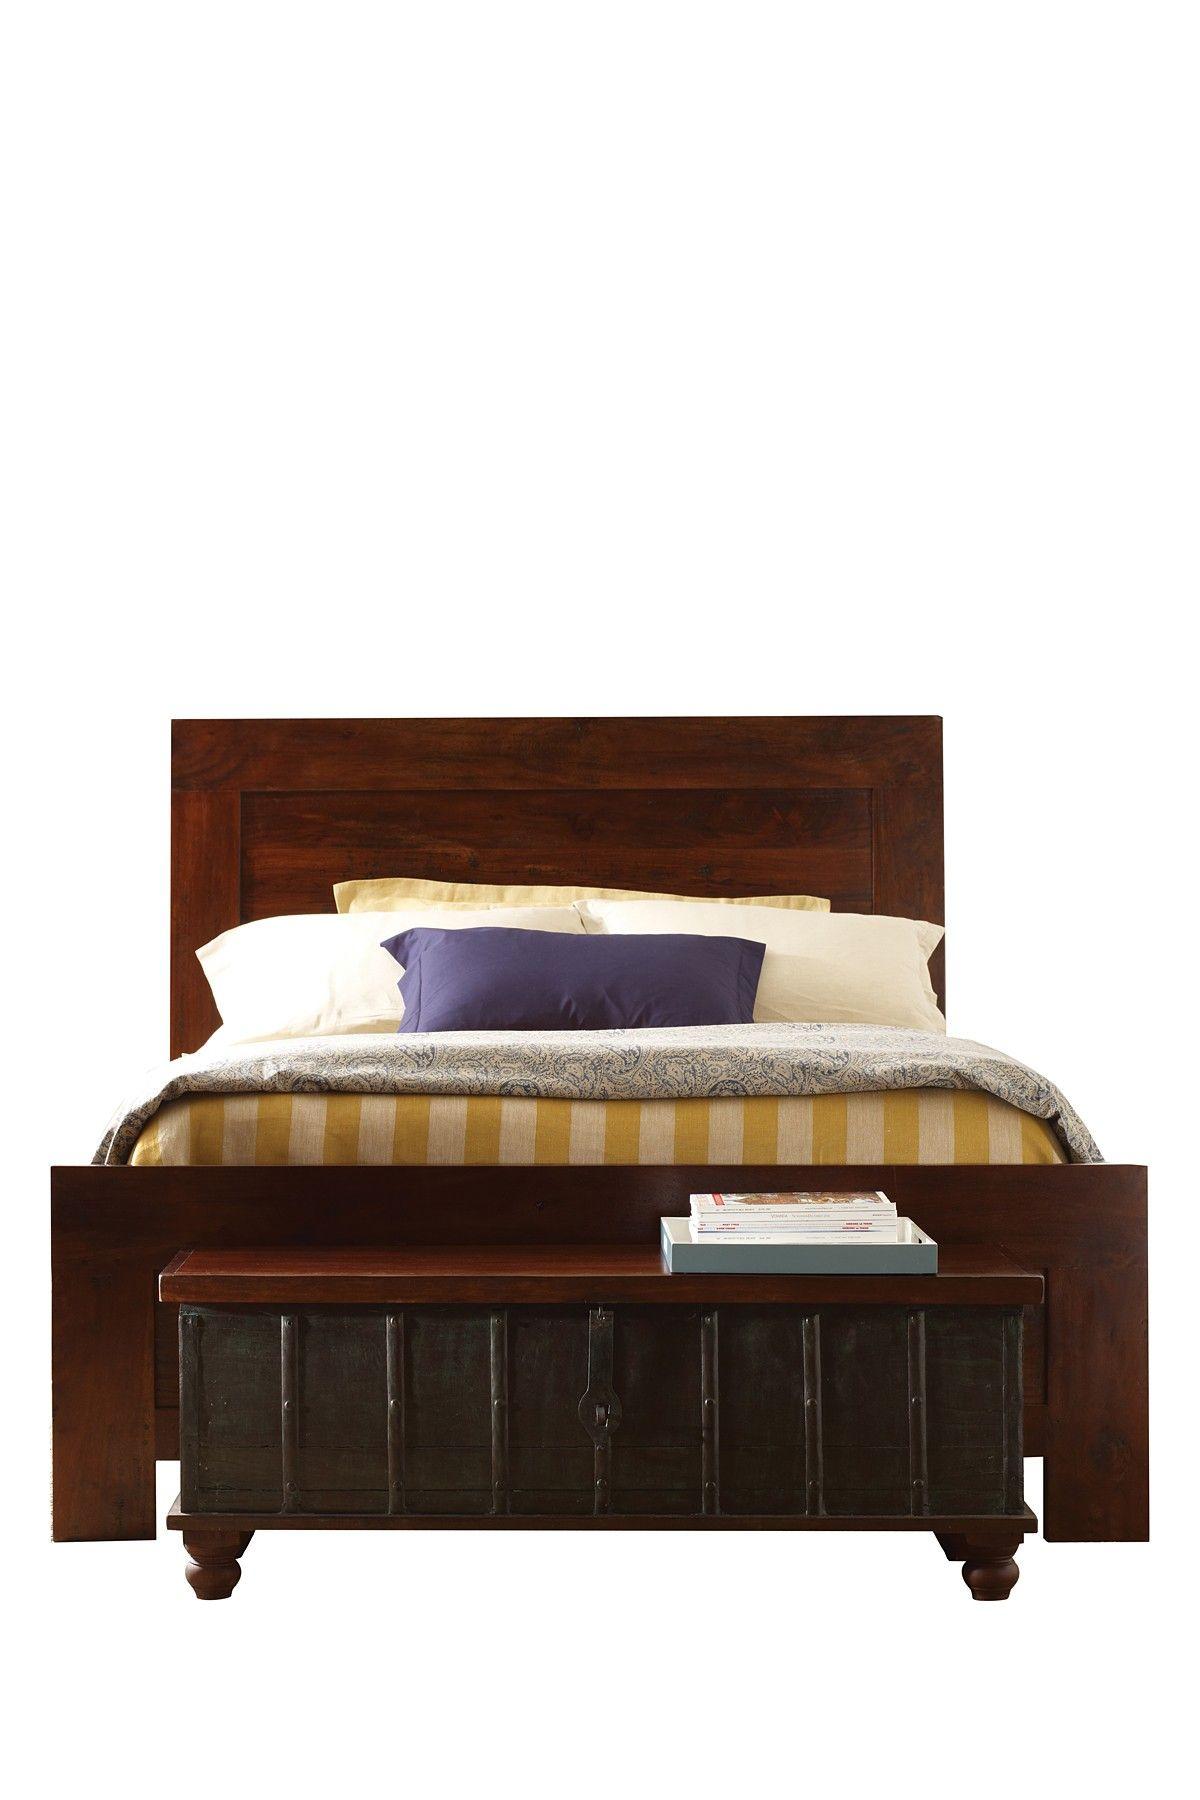 Dakota california king bed master bedroom california - California king bedroom sets for sale ...